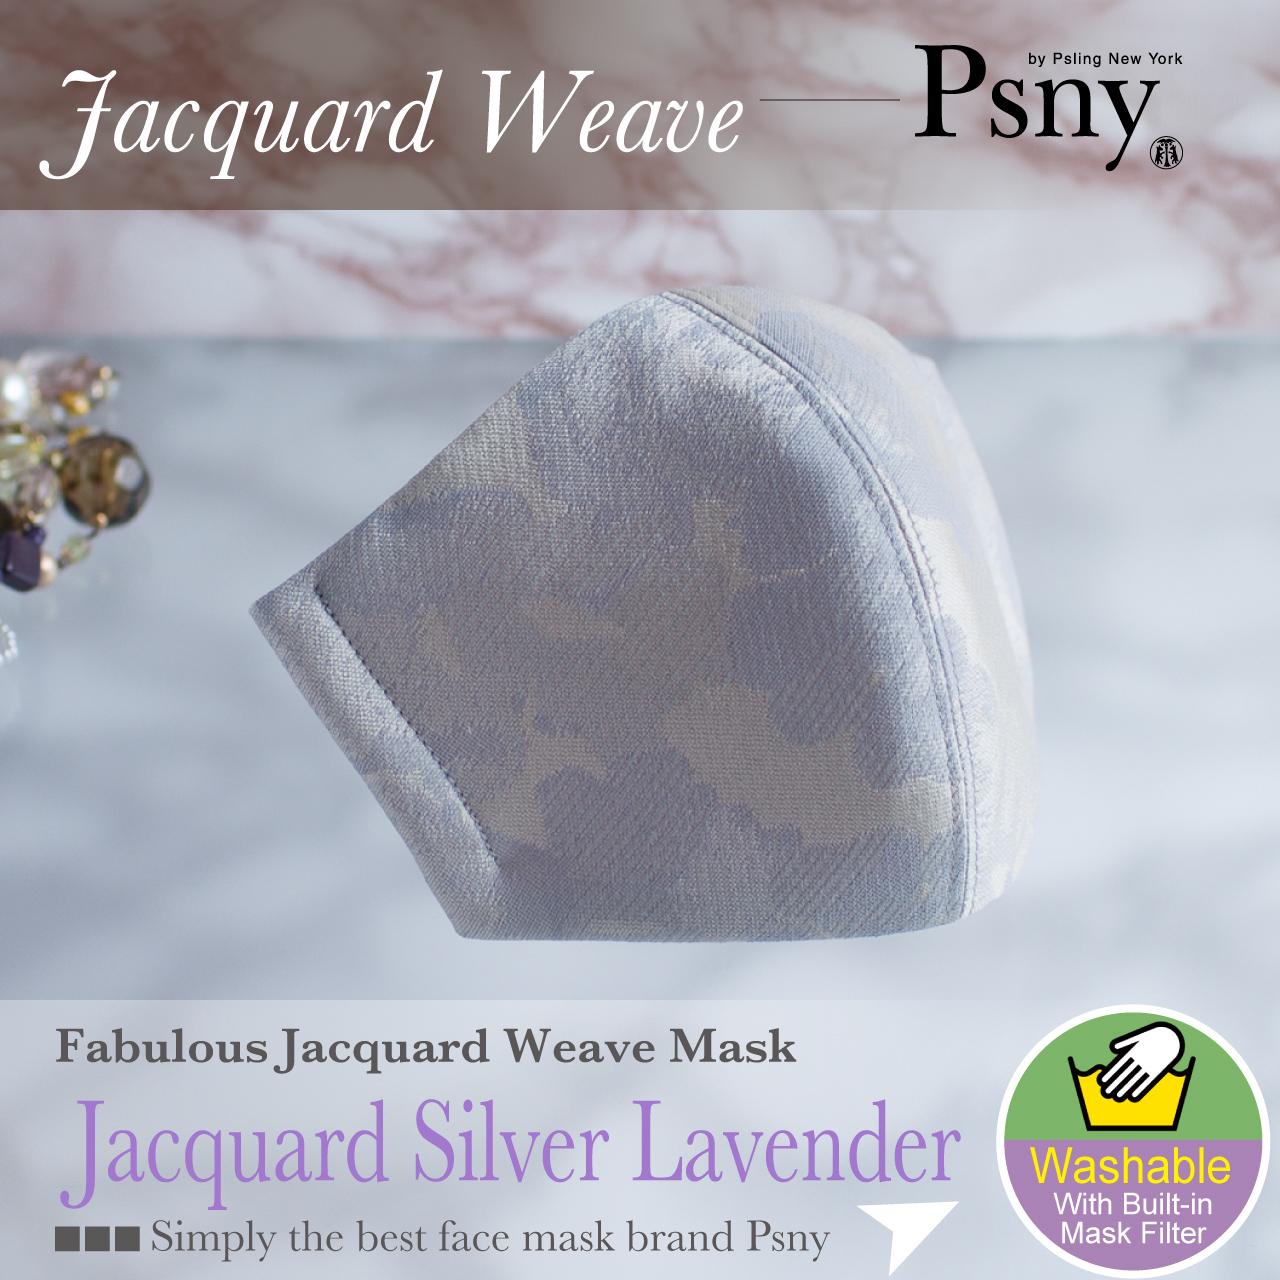 PSNY ジャガード・シルバー ラベンダー 花粉 洗える不織布フィルター入り 立体 大人 高級 フランス マスク 送料無料 FJ7